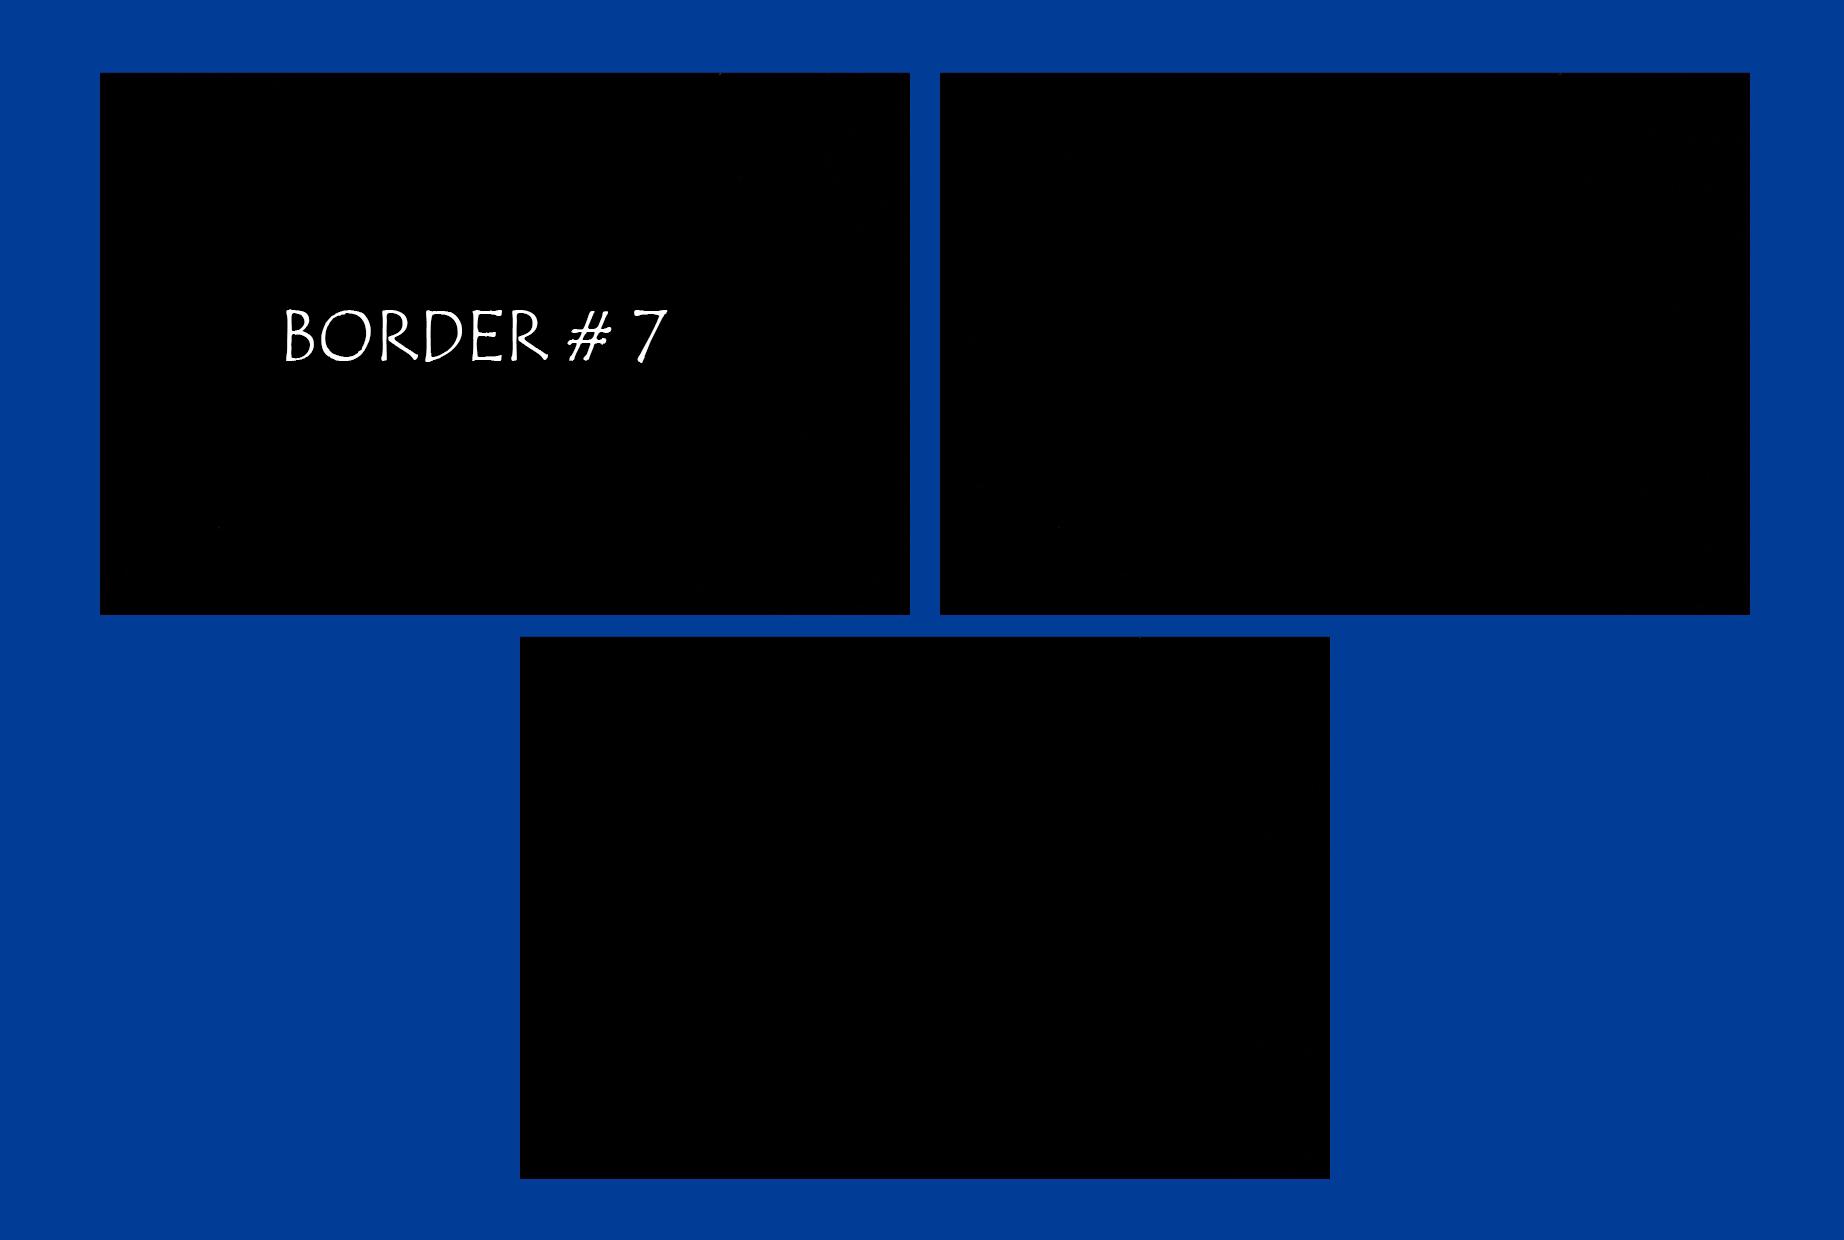 BORDER#7